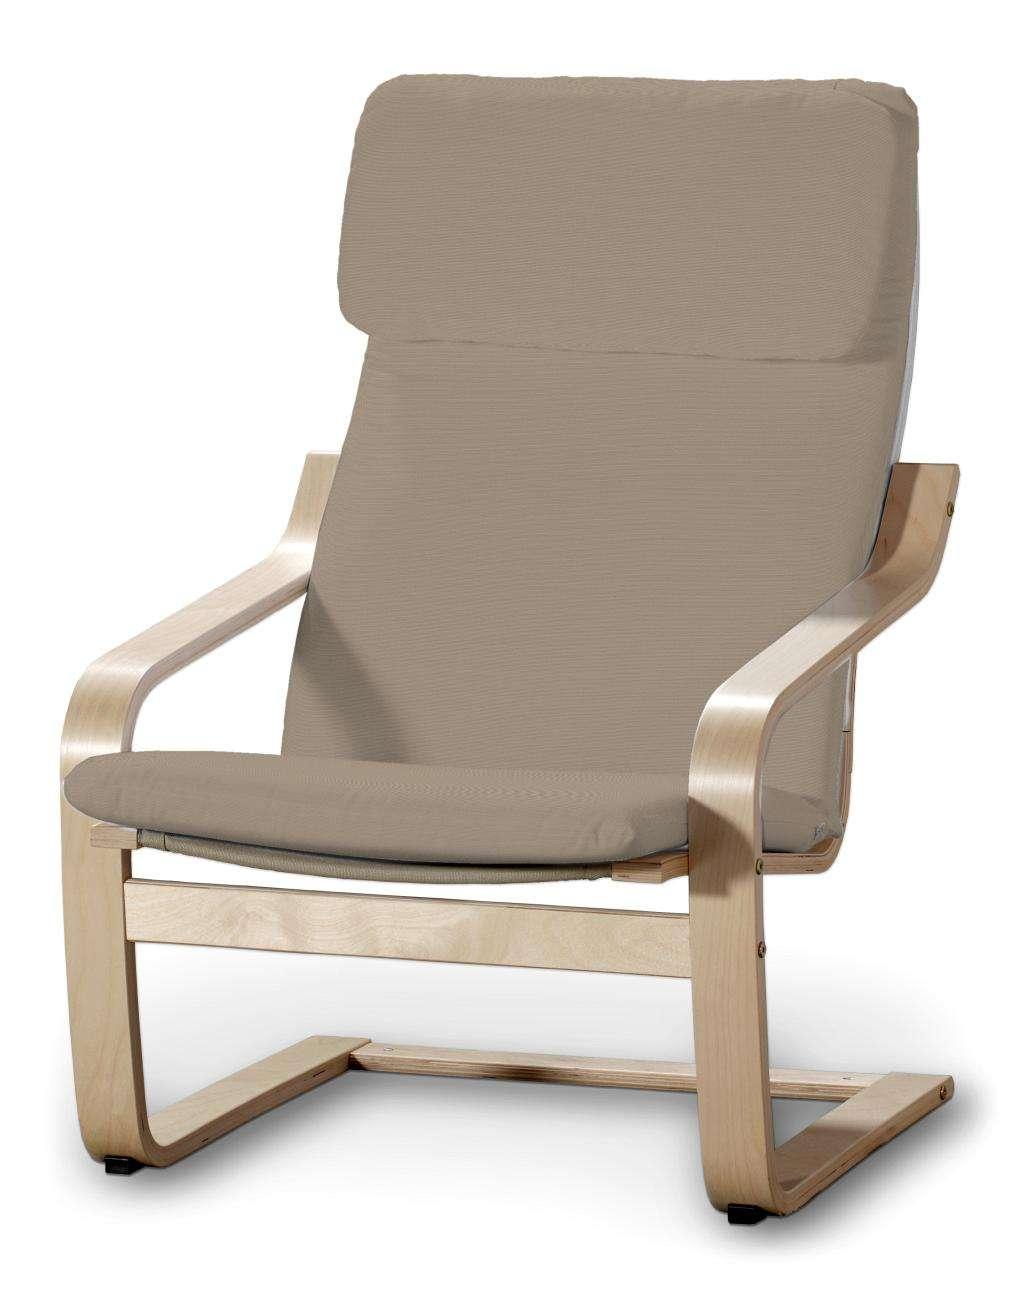 Poduszka na fotel Poäng w kolekcji Cotton Panama, tkanina: 702-28